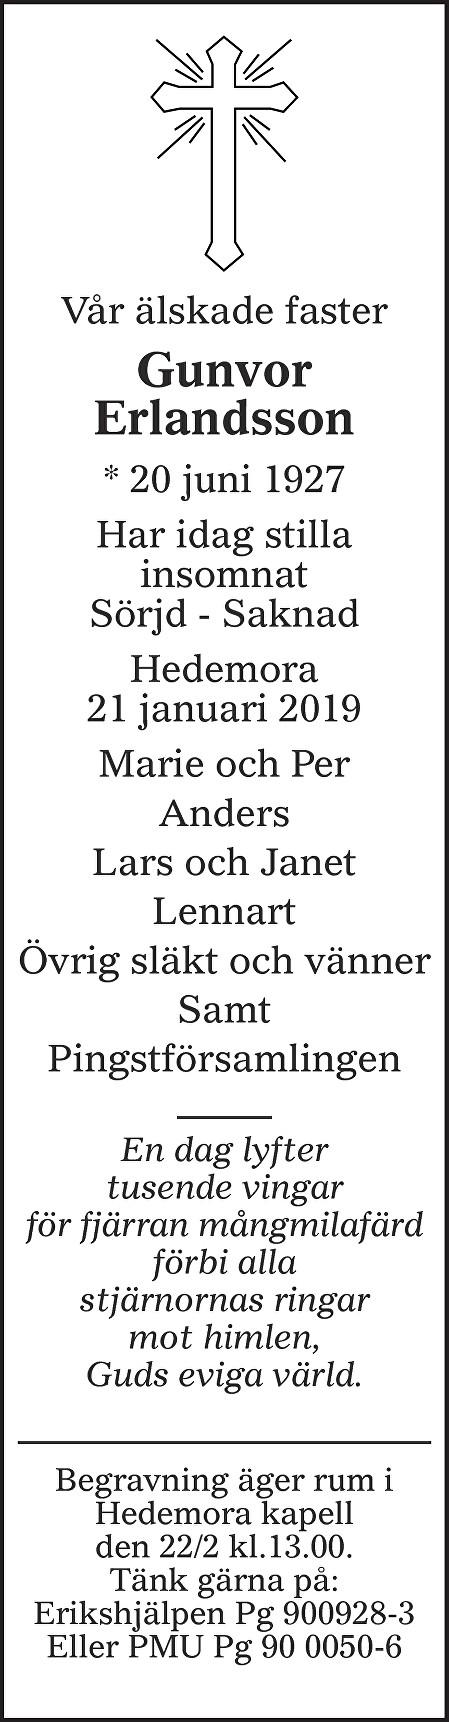 Gunvor Erlandsson Death notice